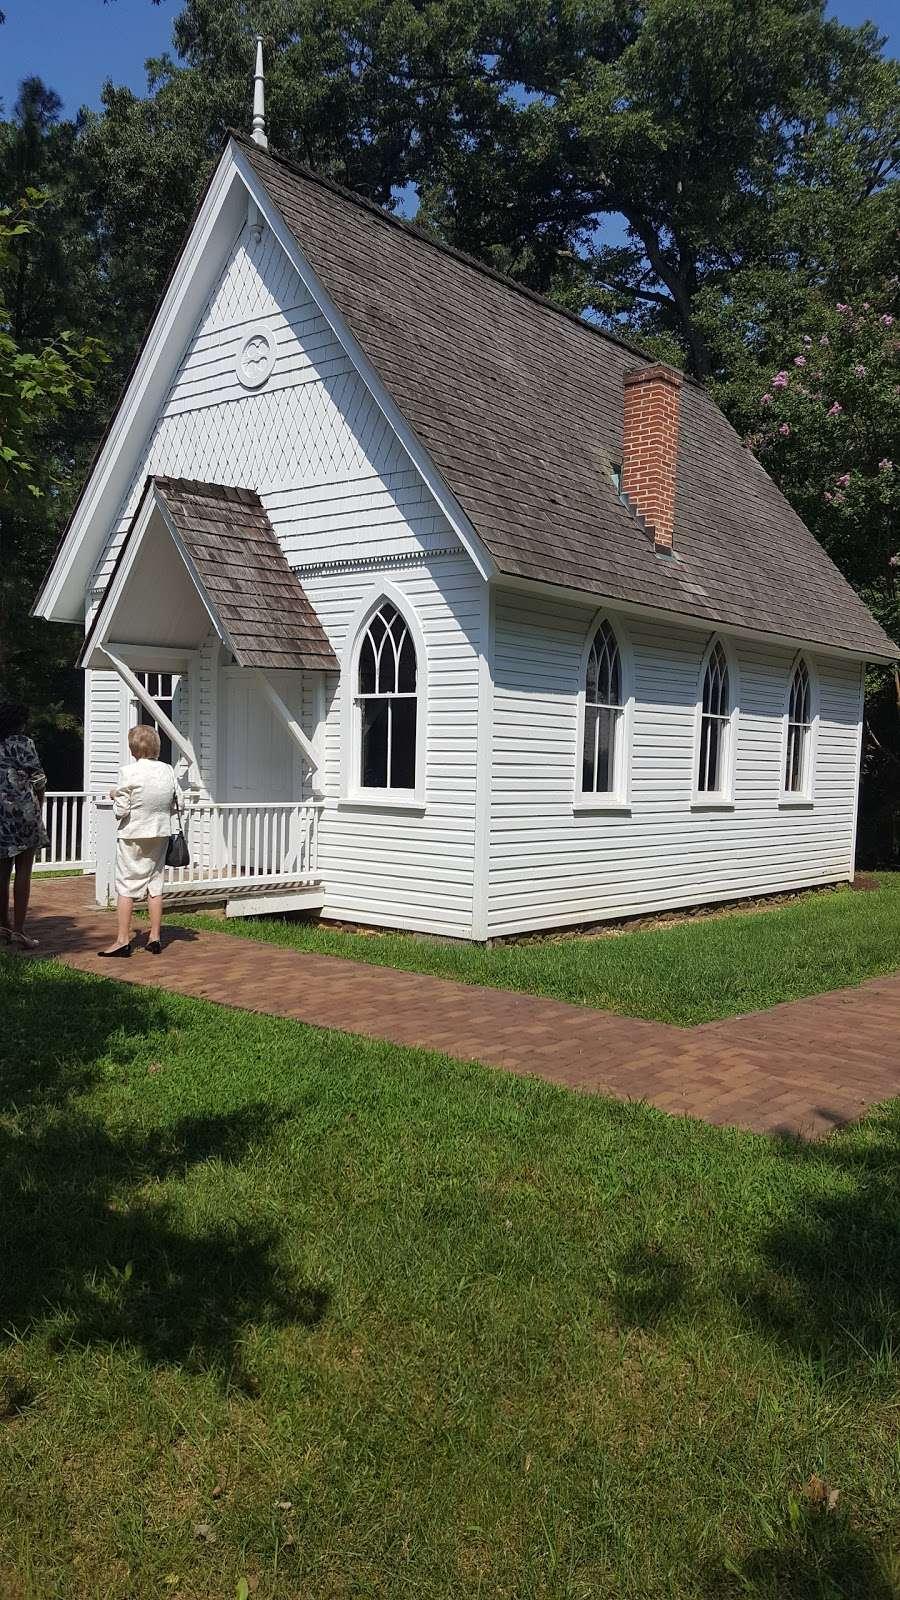 Dorsey Chapel - church  | Photo 2 of 10 | Address: 10704 Brookland Rd, Glenn Dale, MD 20769, USA | Phone: (301) 352-5544